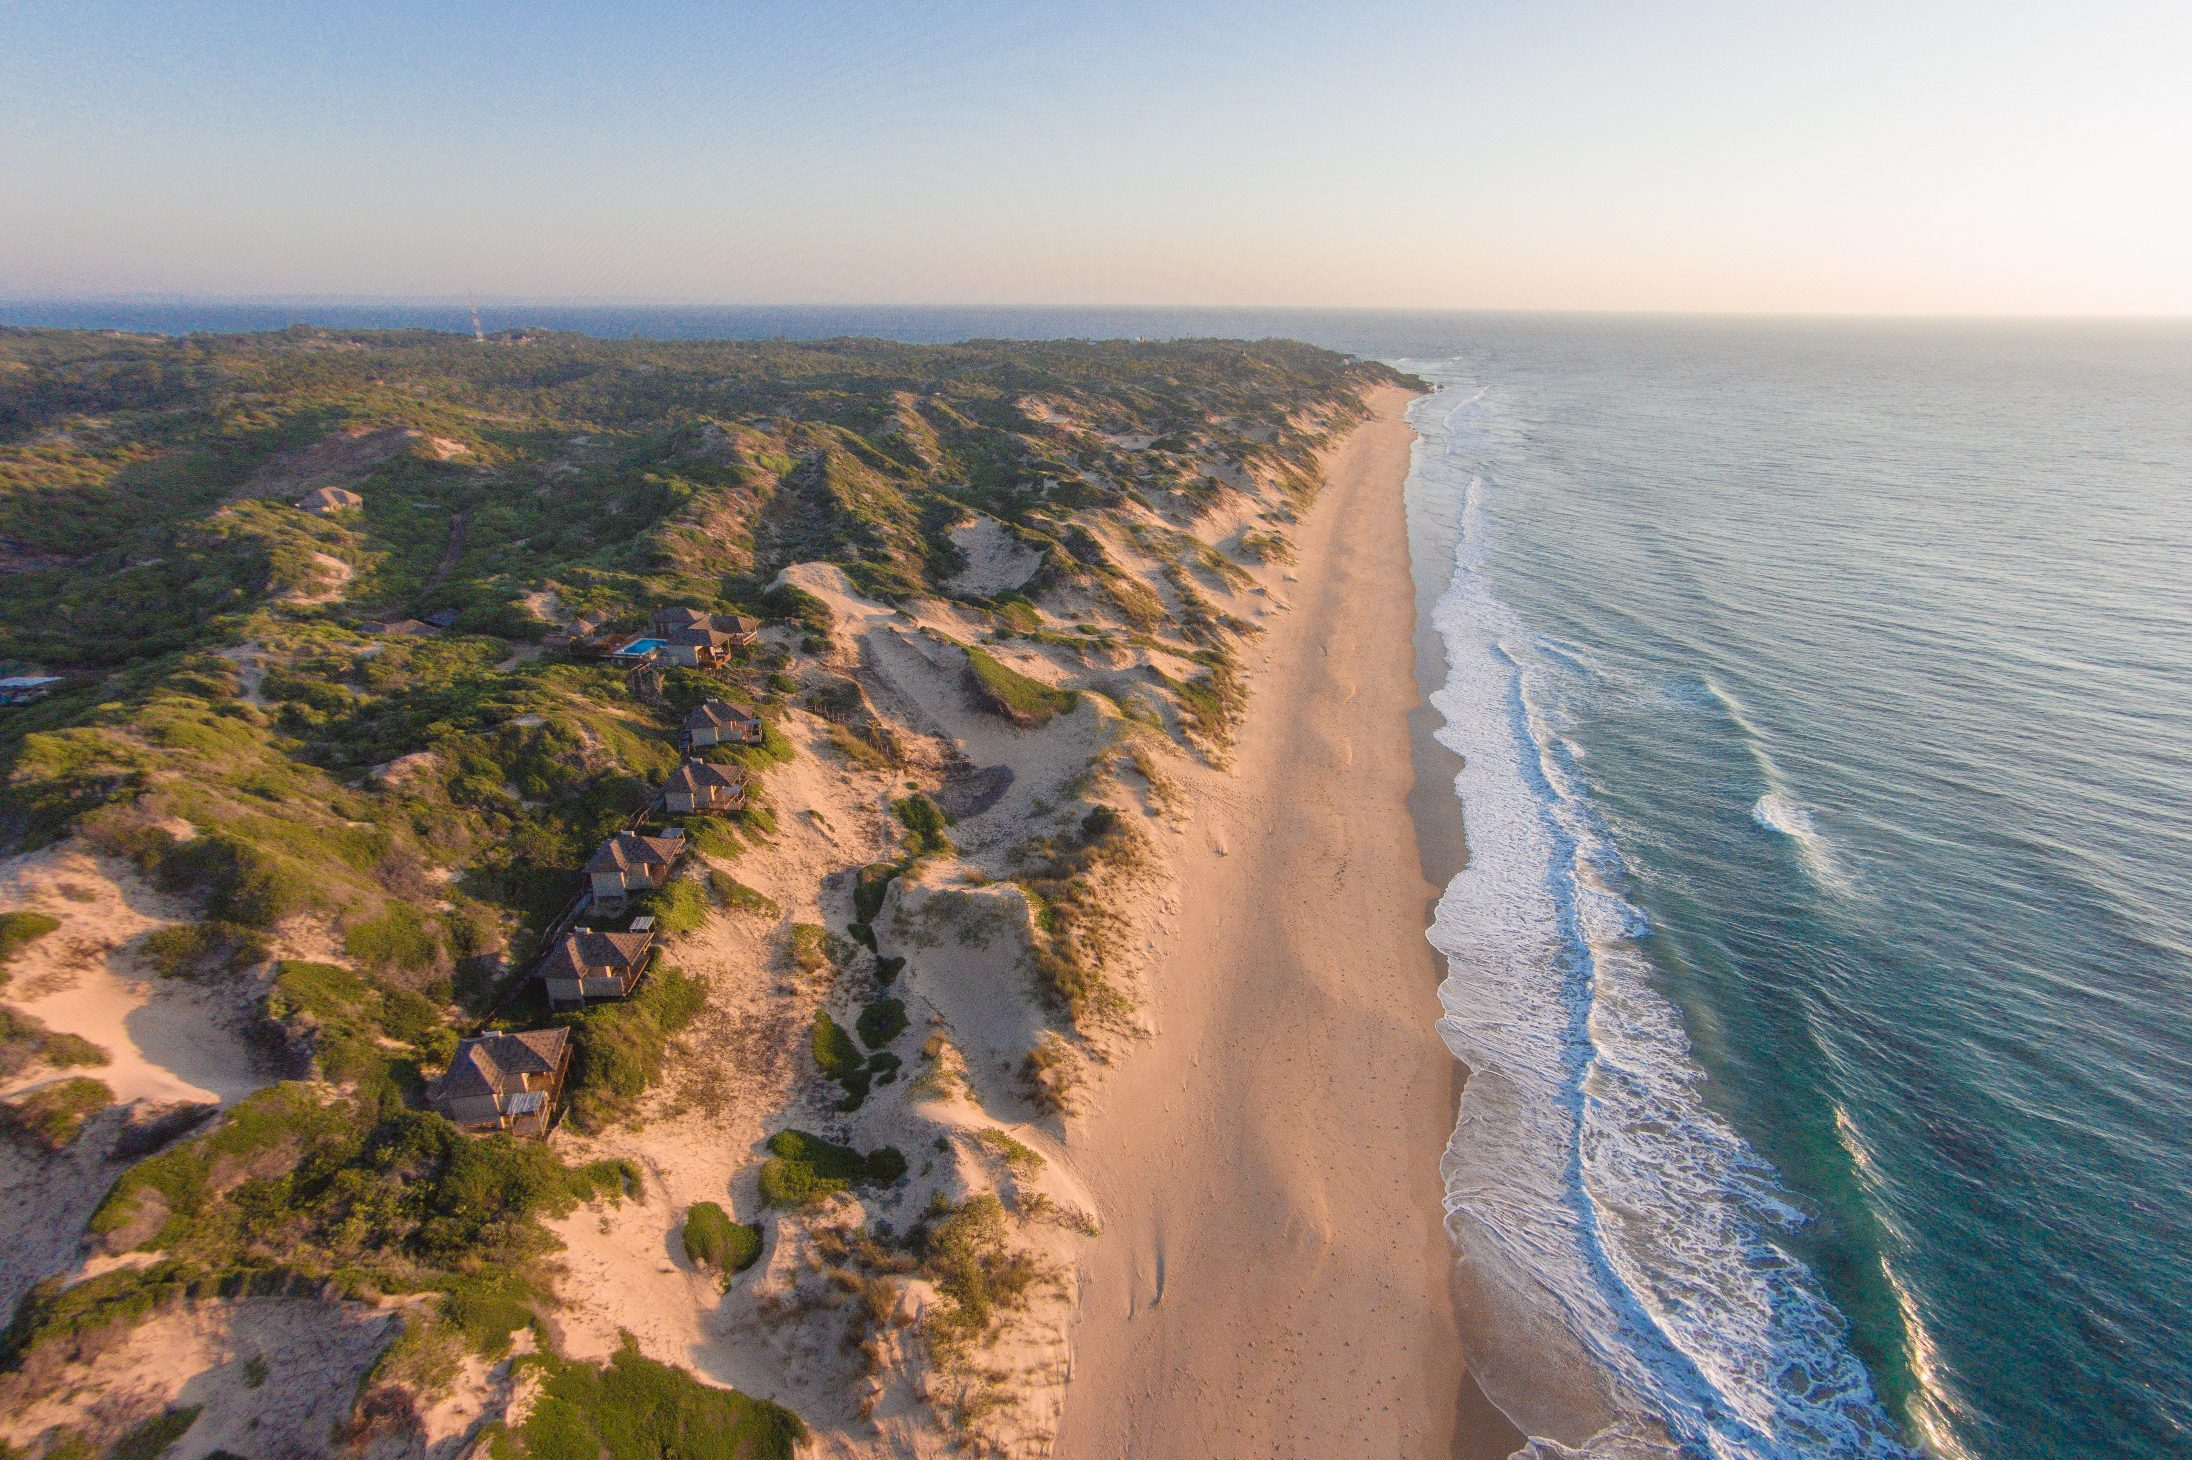 sandy and busy coastline of Sava Dunes in Inhambane